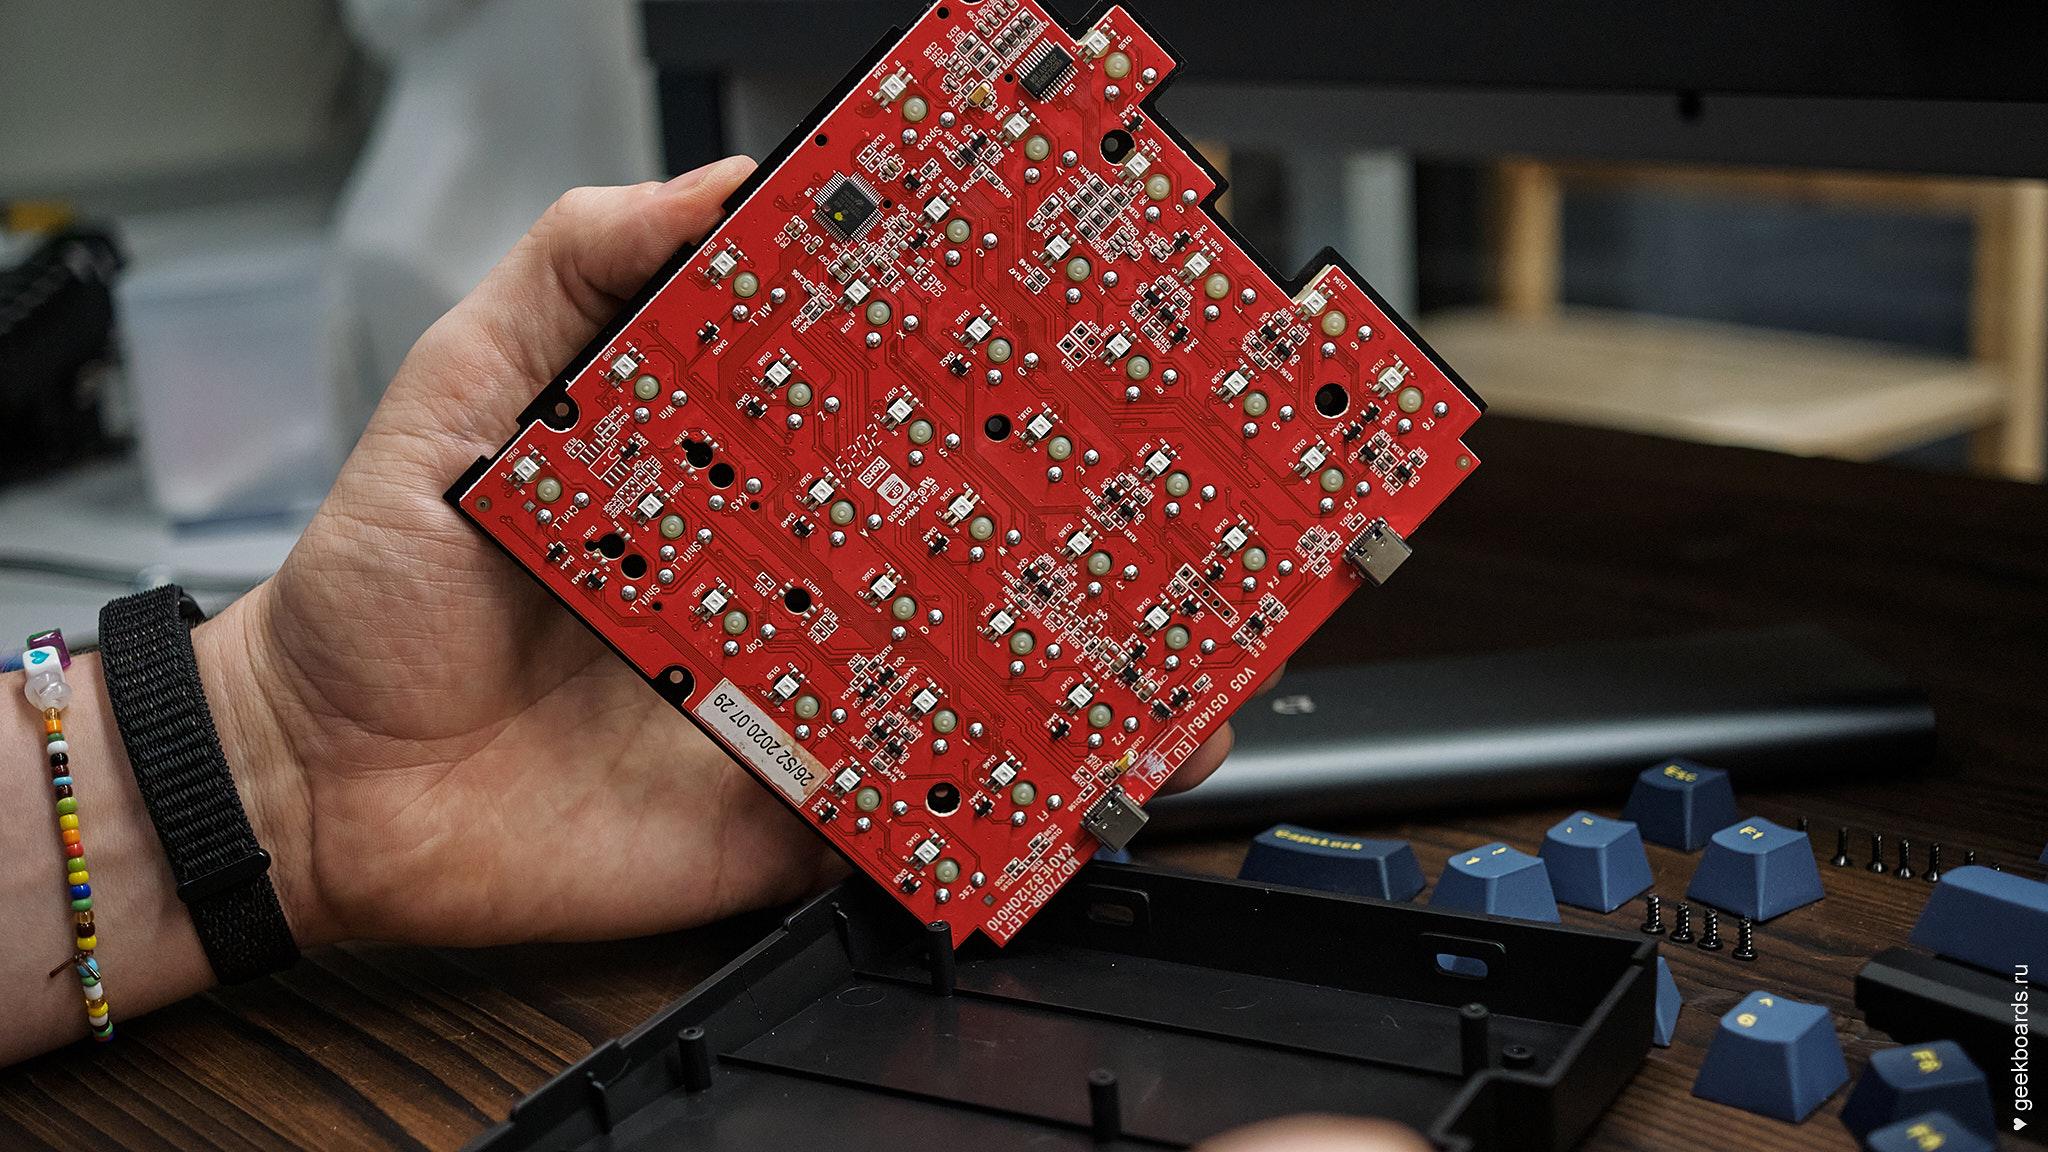 MISTEL BAROCCO MD770RGB BT BLACK вынимаем клавиатуру из корпуса